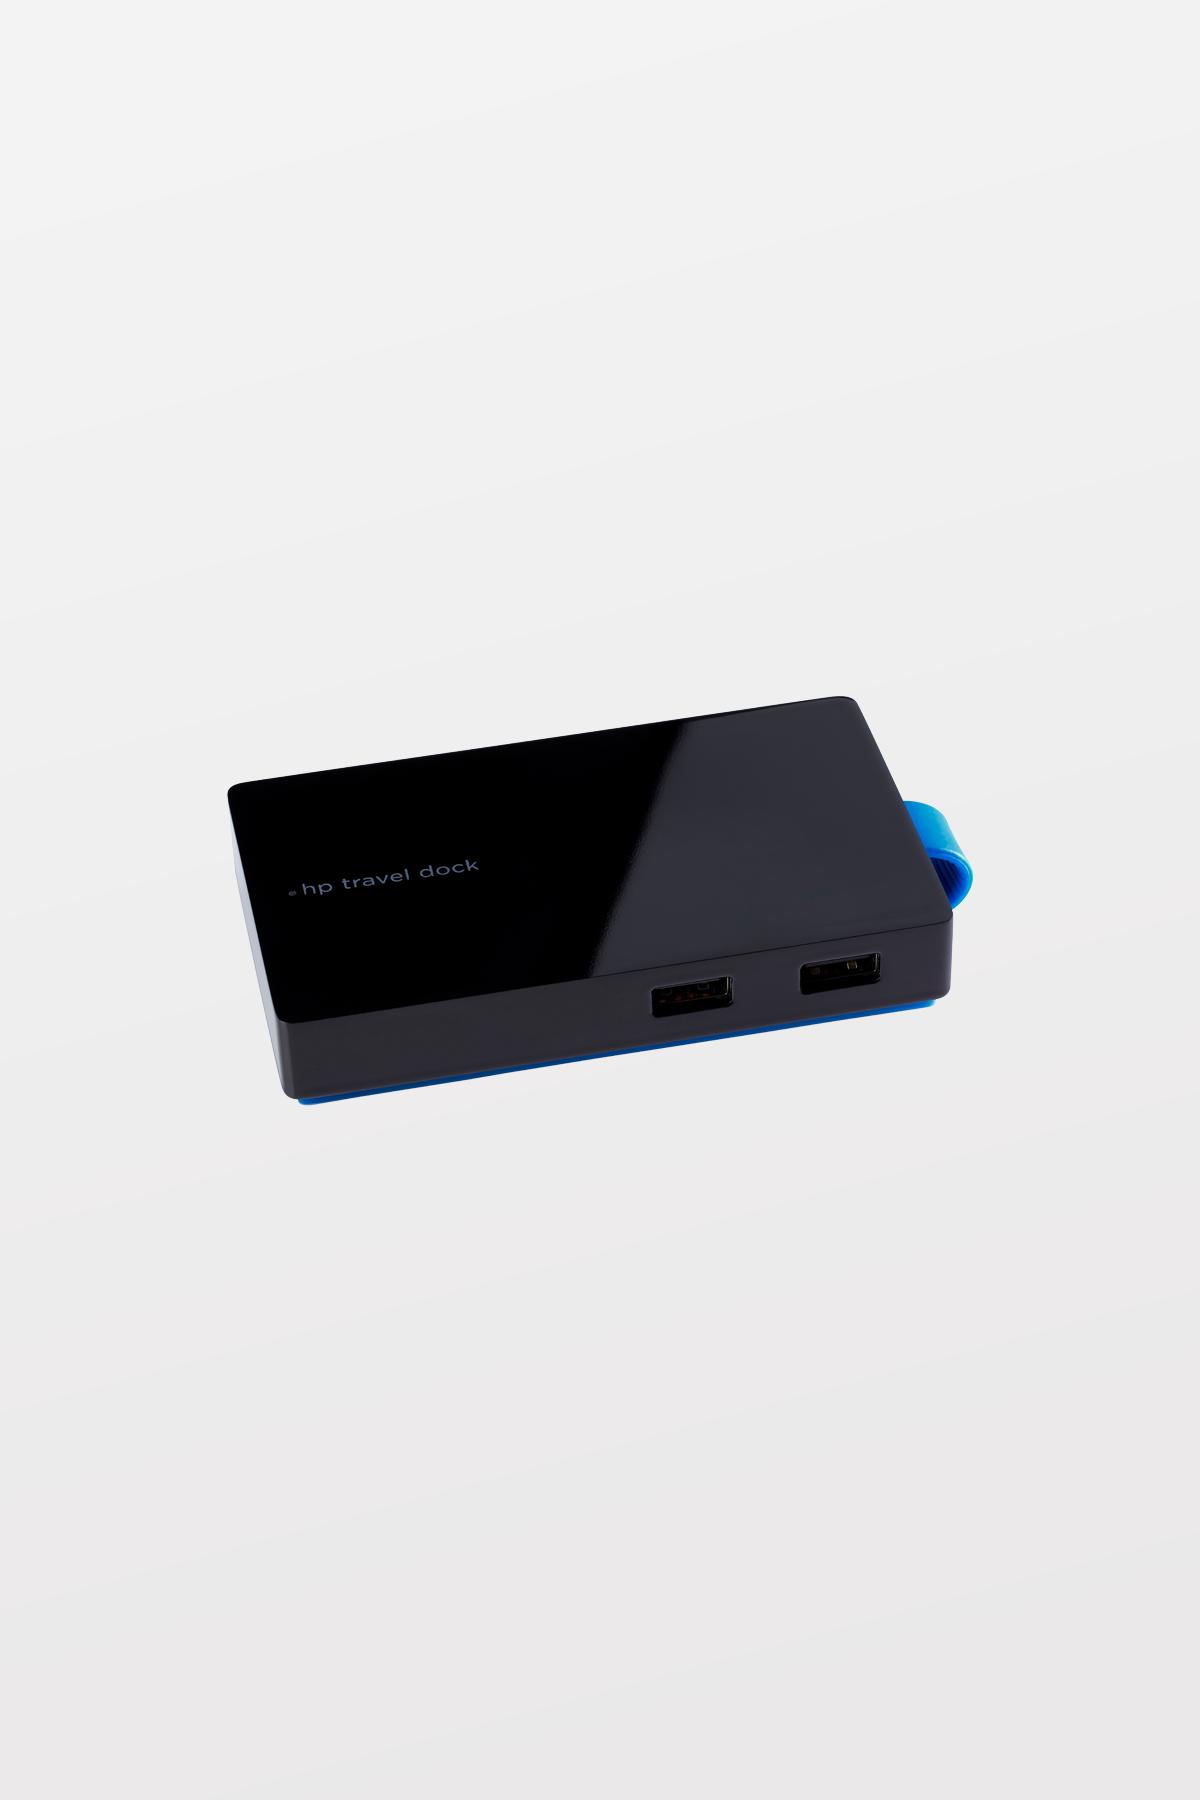 HP - USB Travel Dock - USB3/RJ45/HDMI/VGA